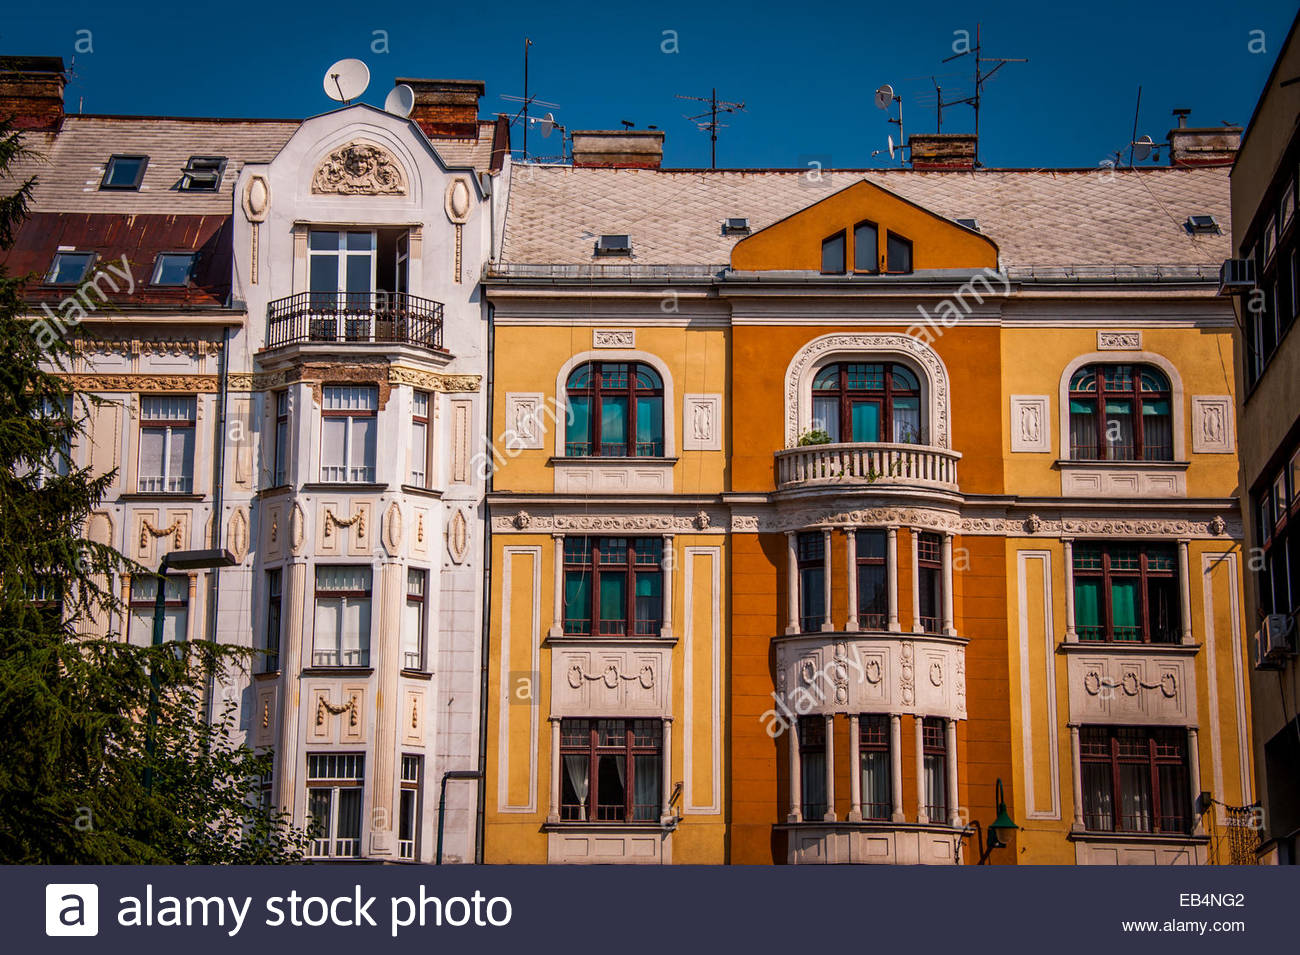 Colorful Austro-Hungarian buildings in Sarajevo. - Stock Image